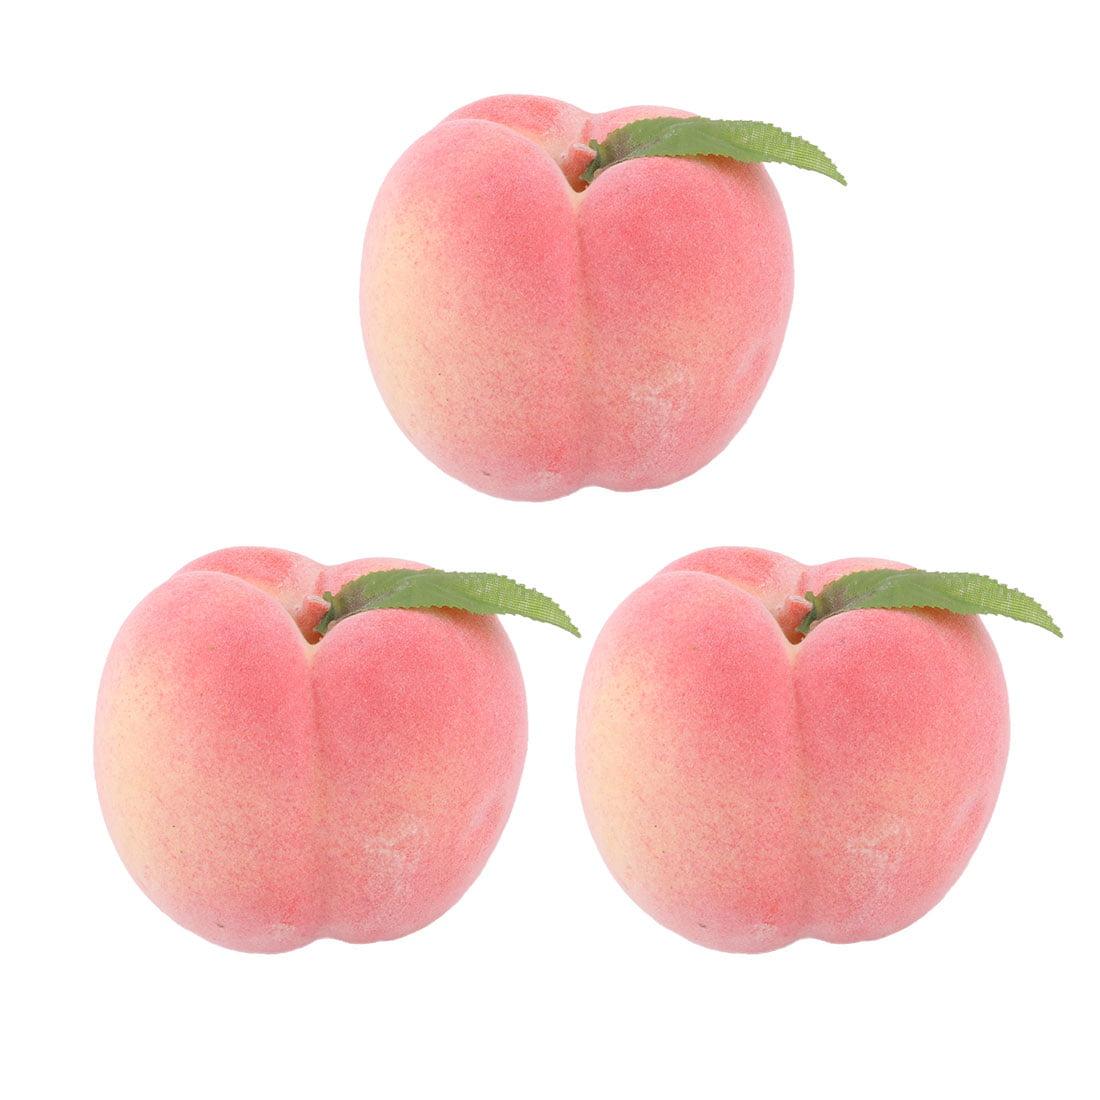 Home Office Decor Foam Lifelike Artificial Emulation Fruit Peach Mold Pink 3pcs